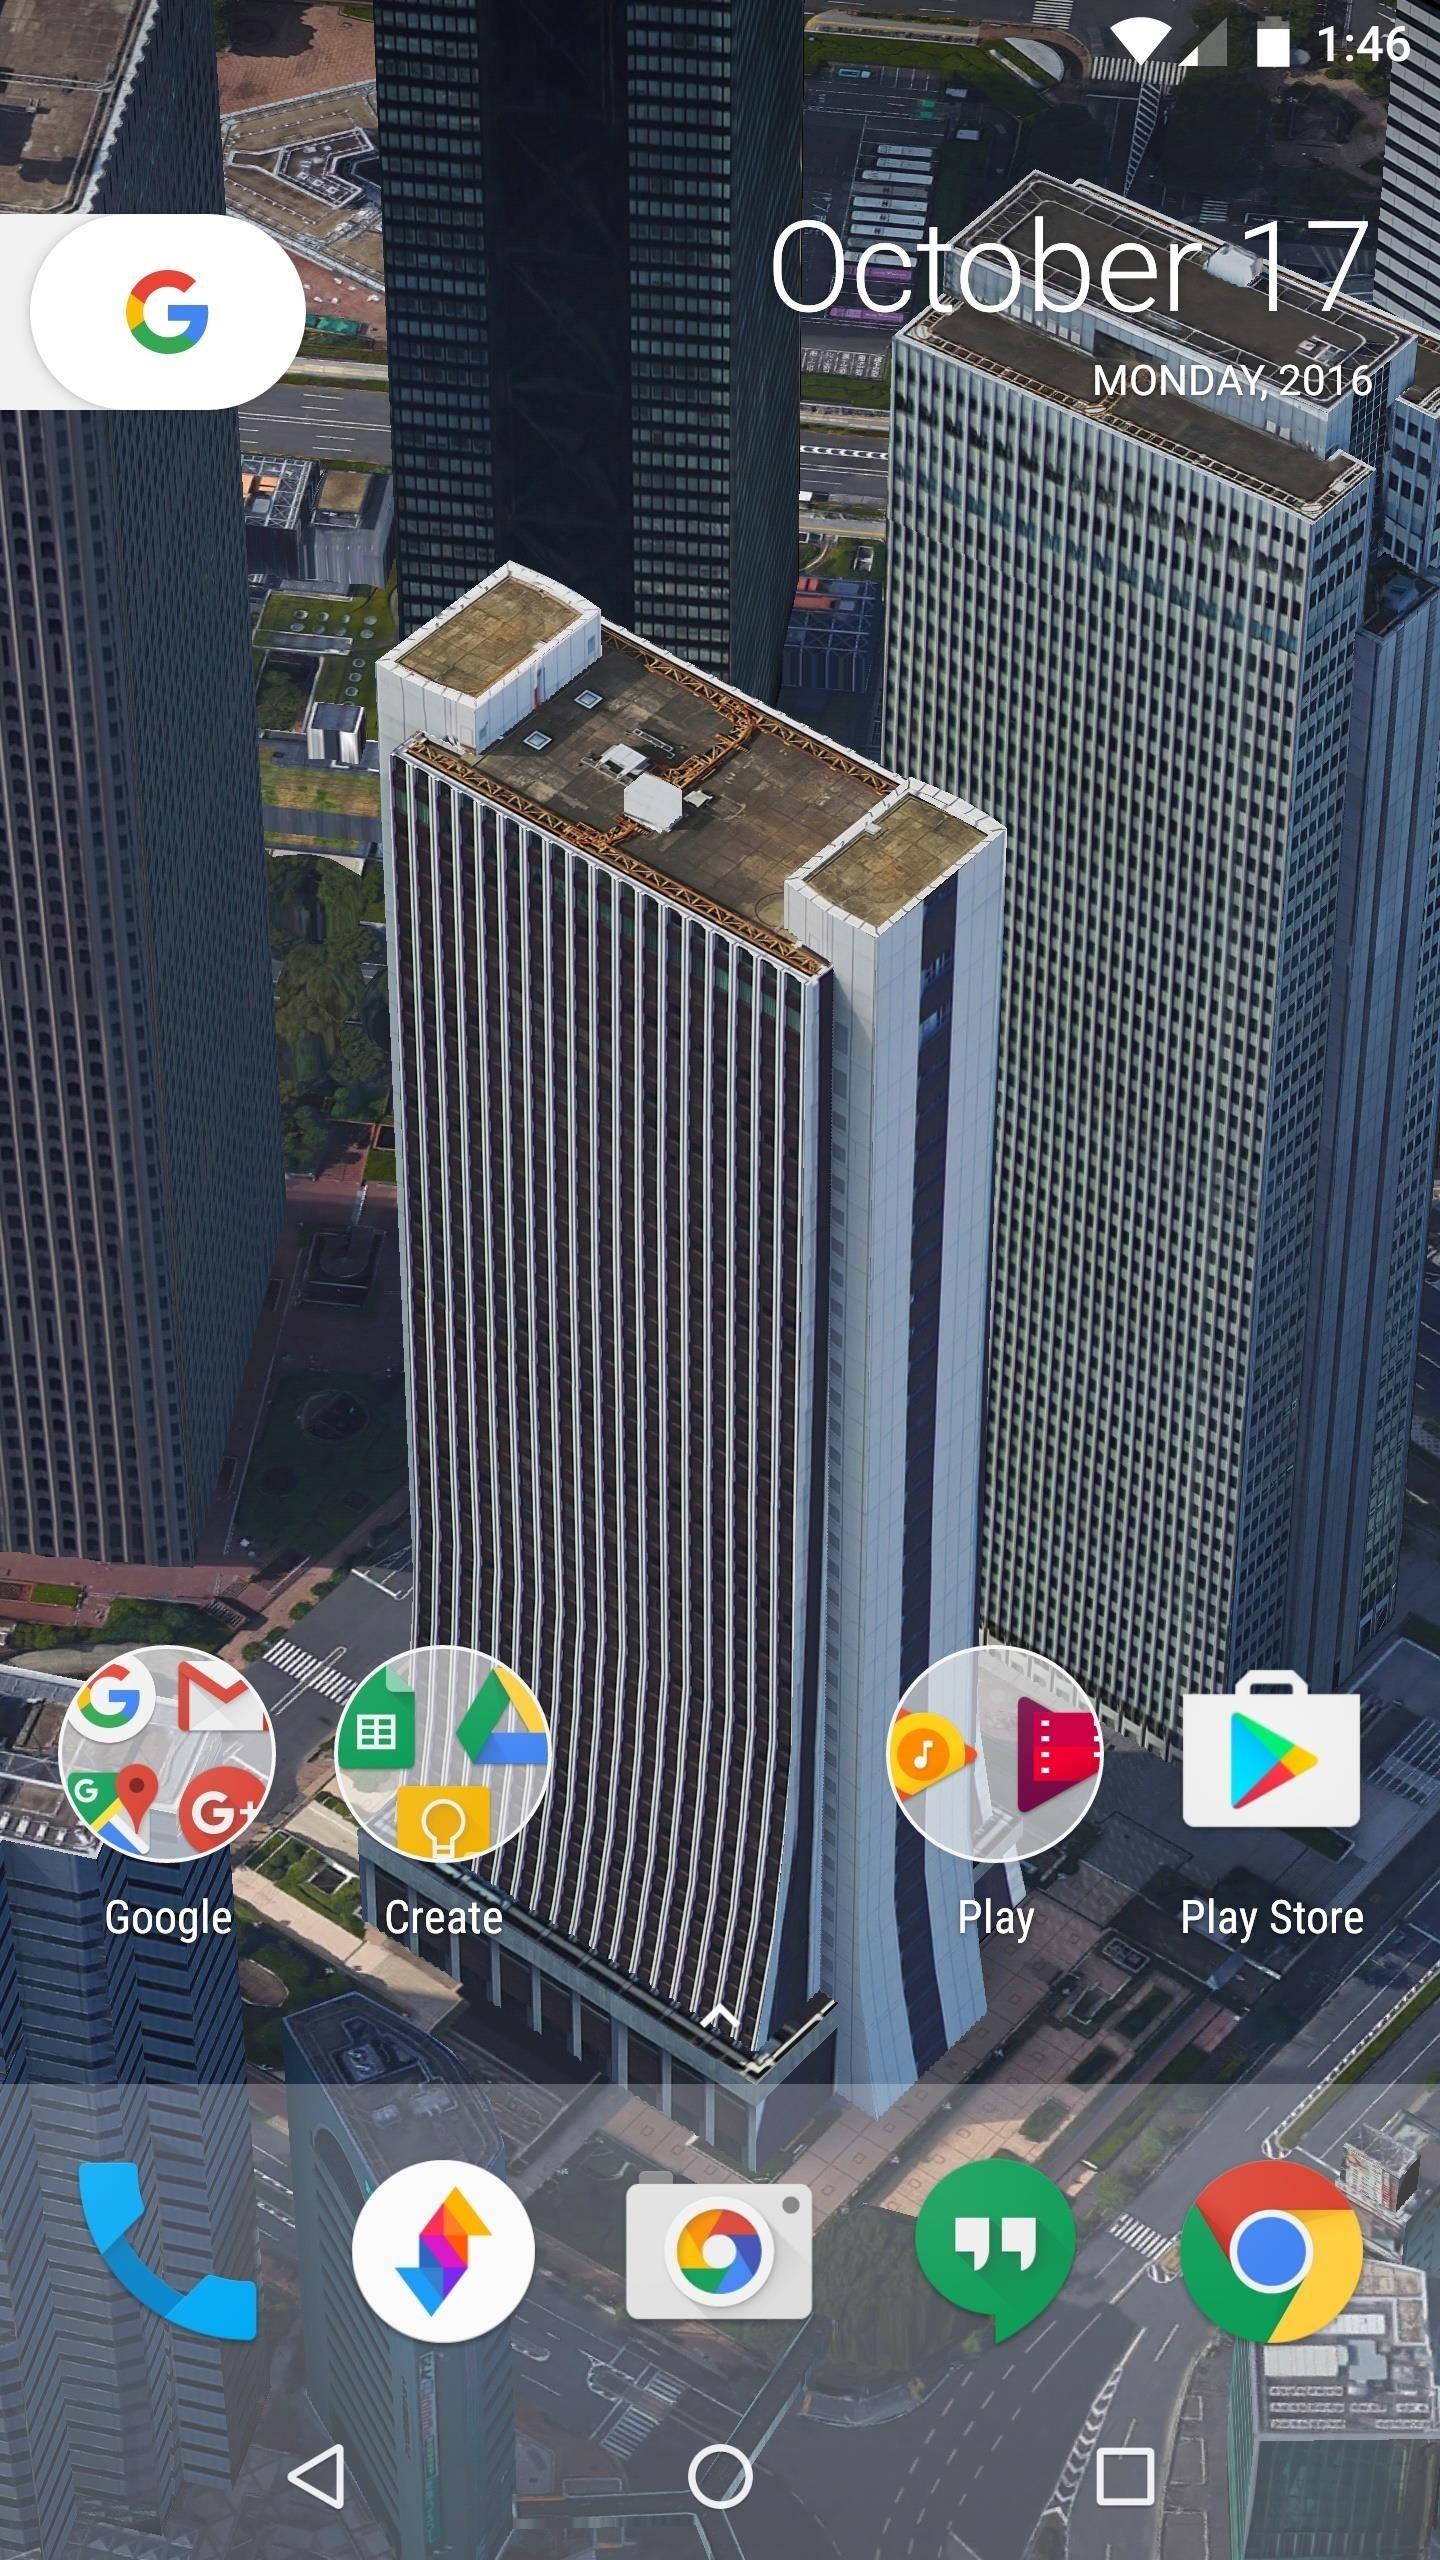 Earth 3d Live Wallpaper Mac Google Pixel Wallpaper 183 ① Download Free High Resolution